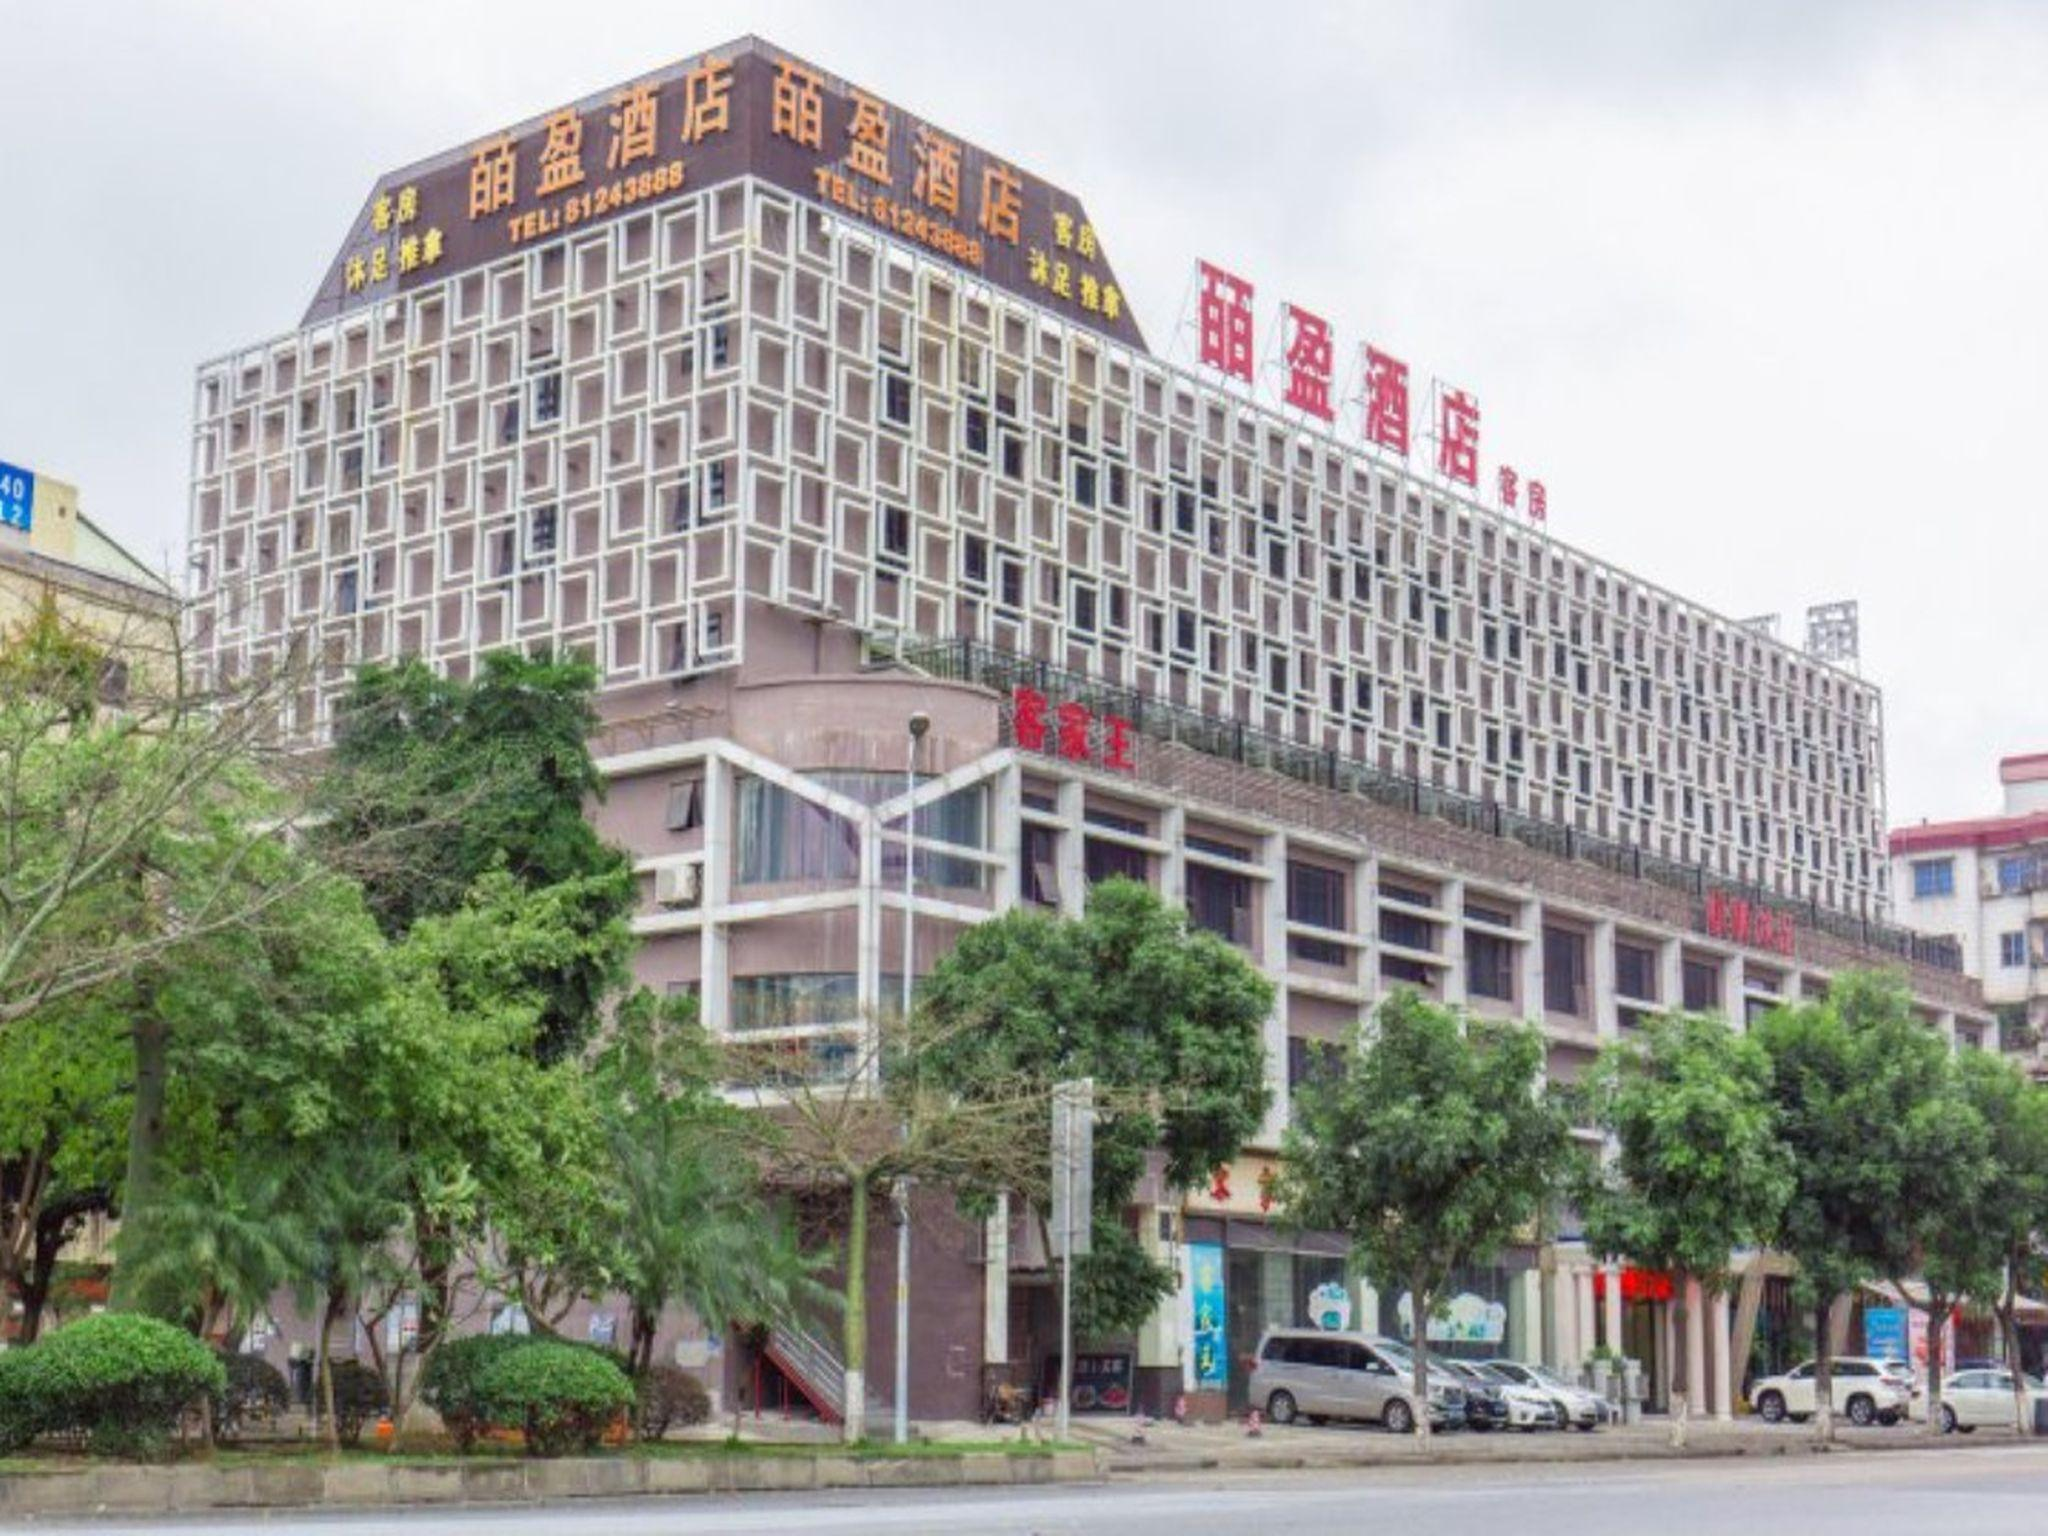 BI YING HOTEL